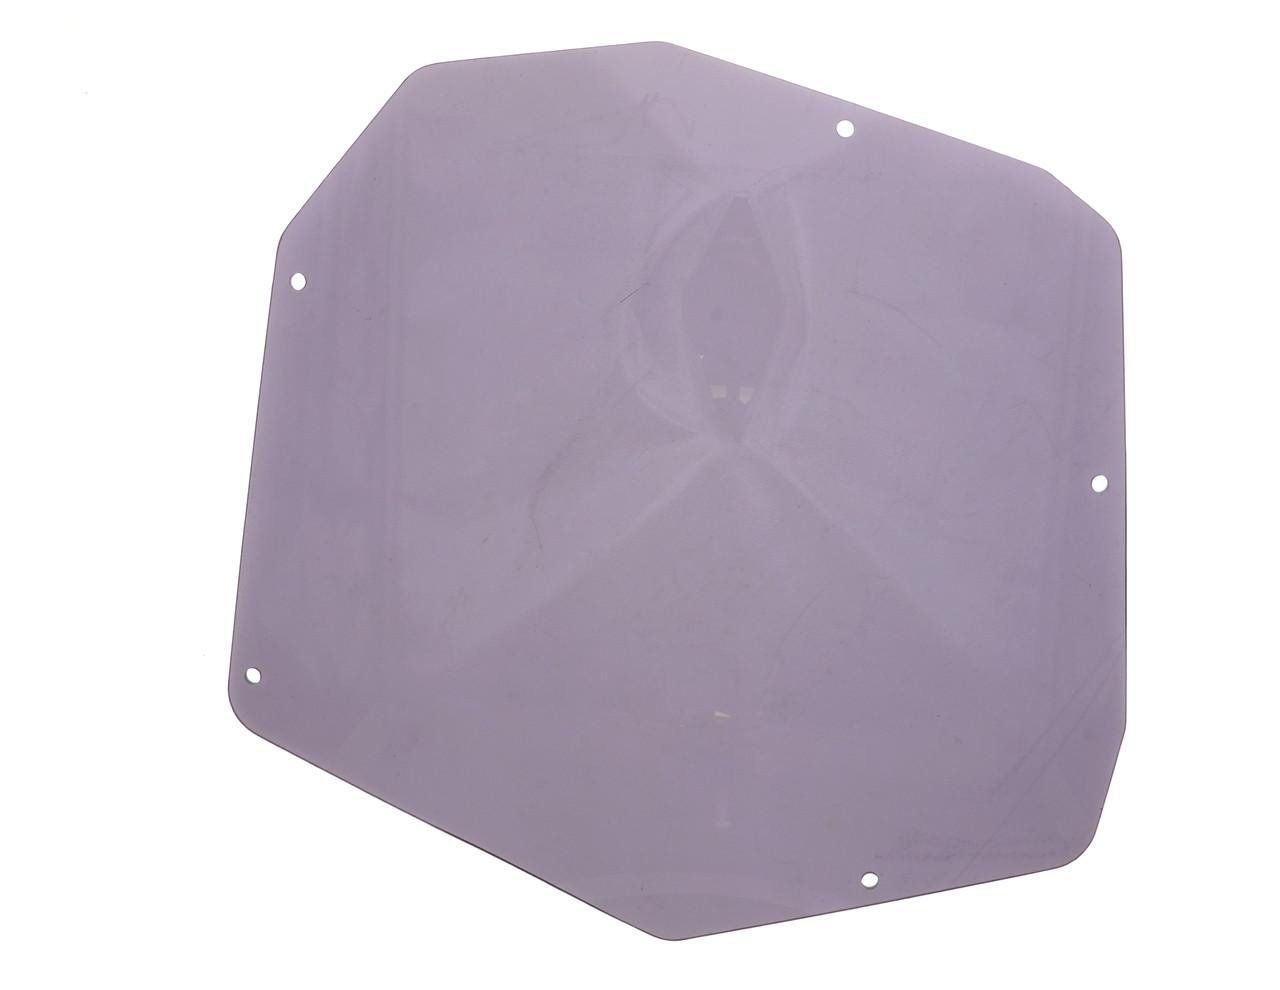 Acrylic Side header for High Five (HF1-FP-04-R2)